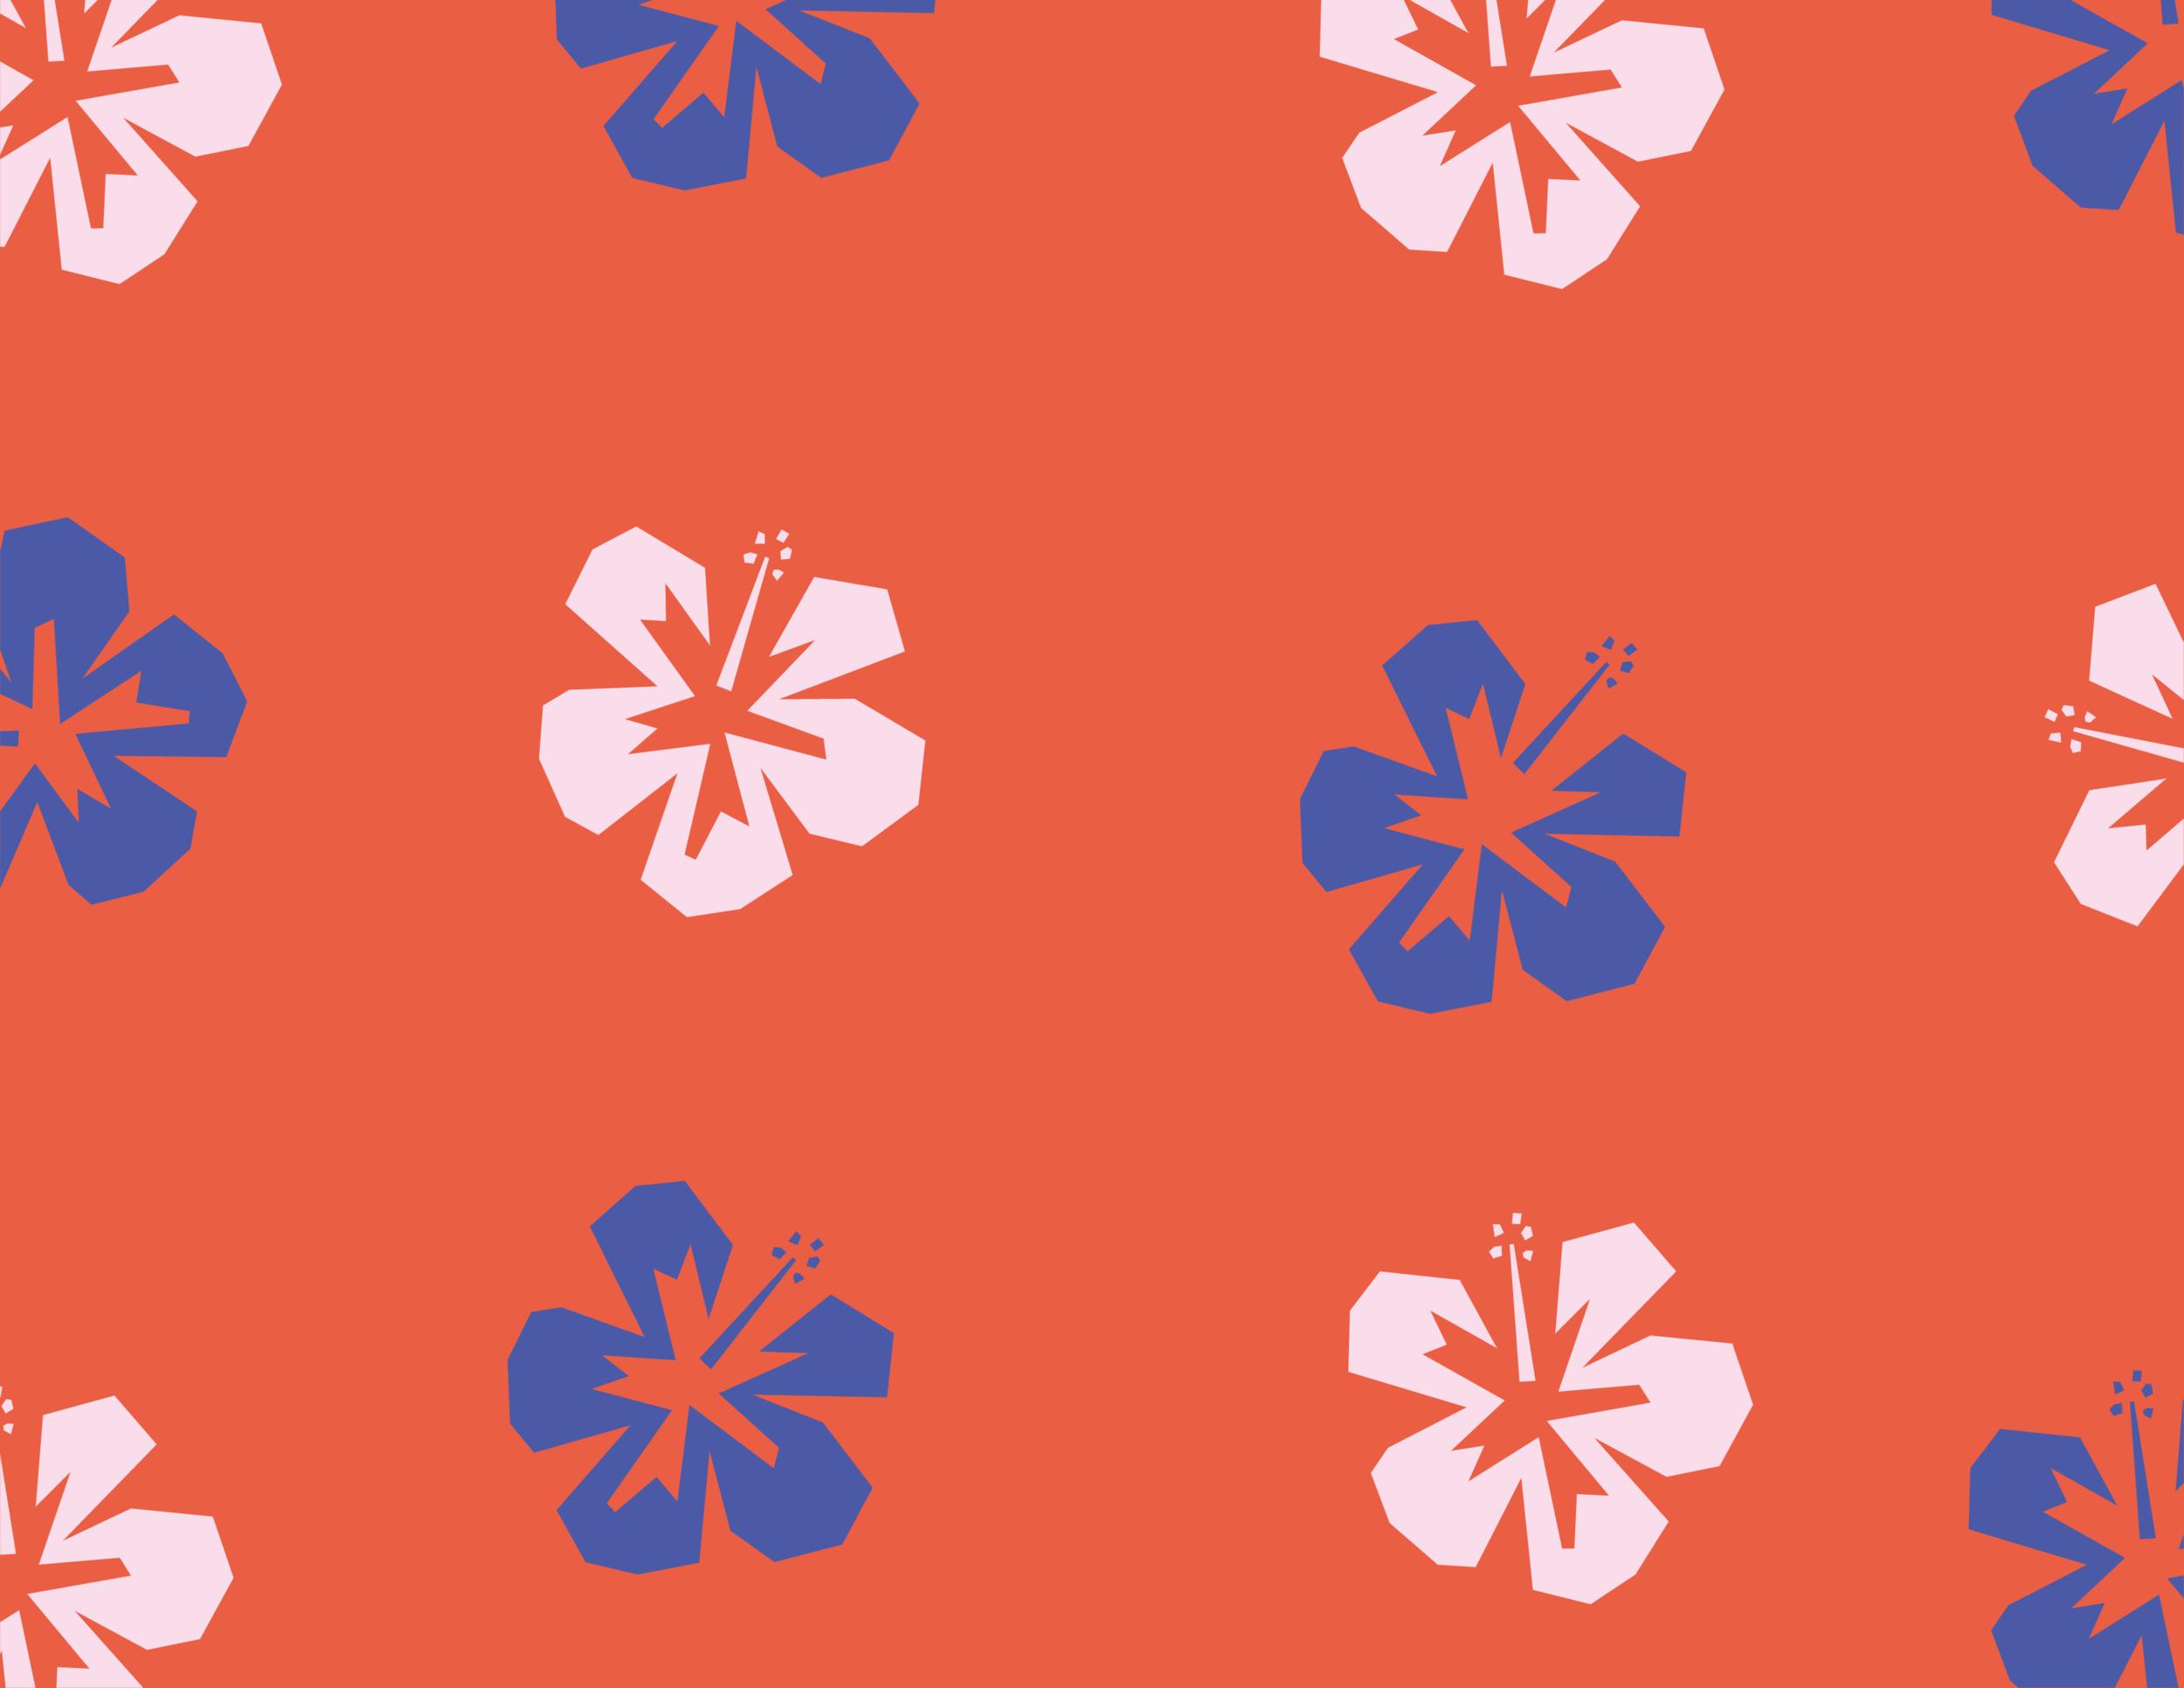 ICJ_Patterns_Flowers_RGB.png